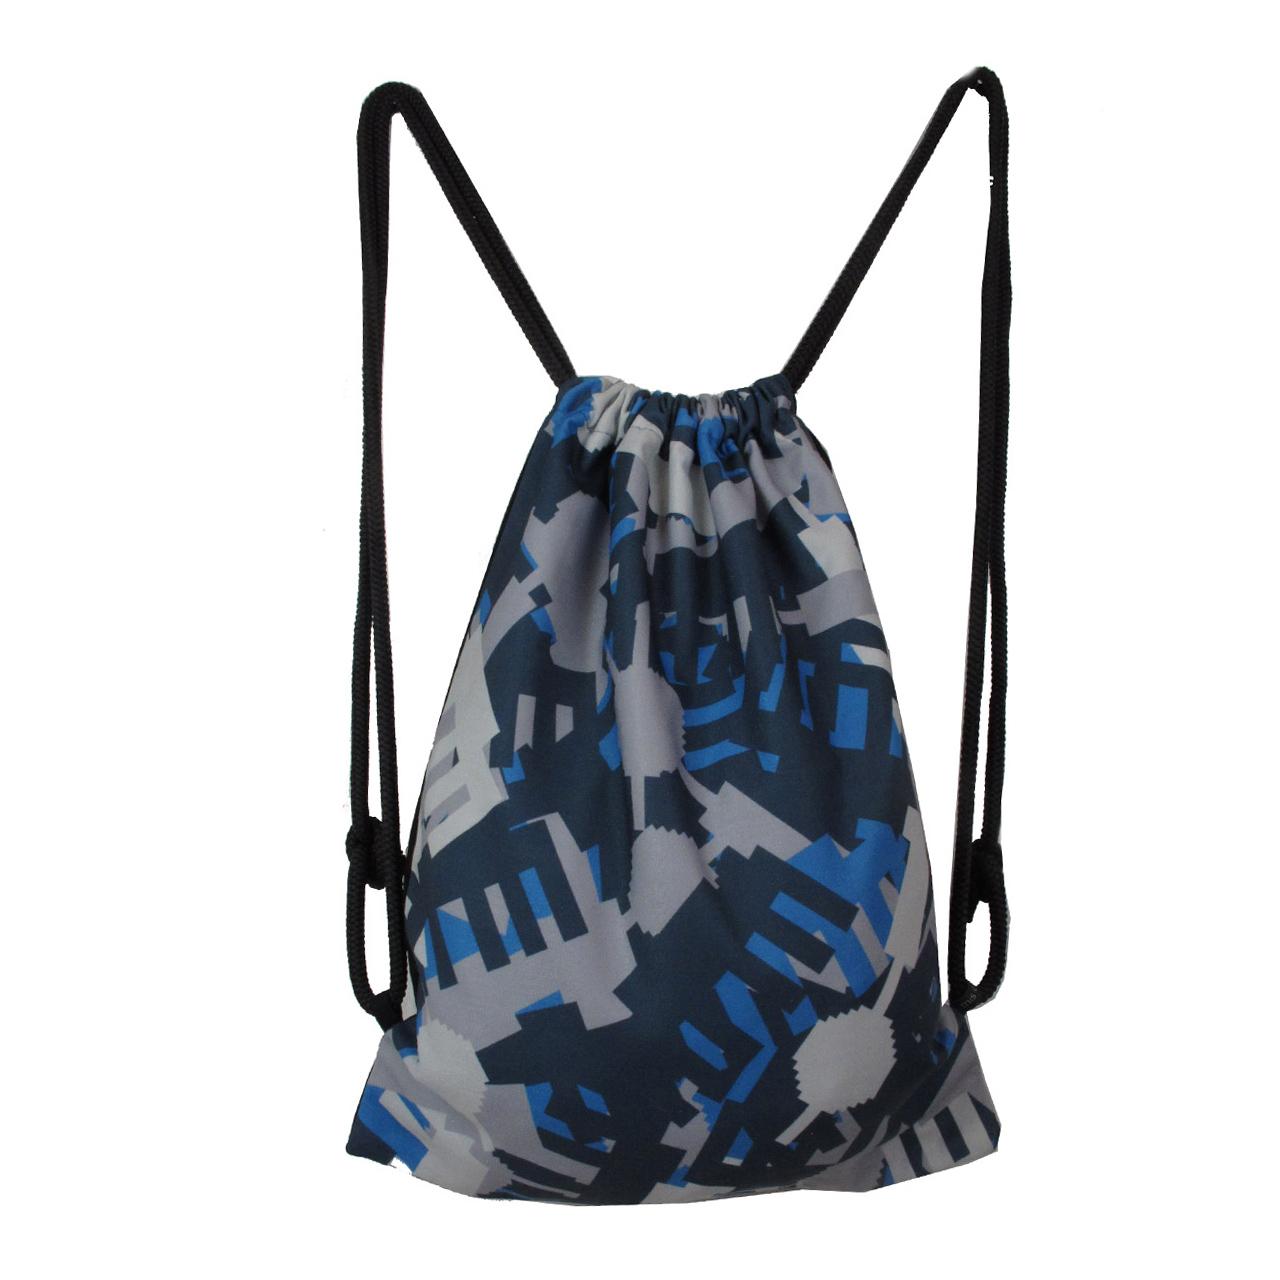 Rucksack/Gymbag Allover Camouflage blau/grau